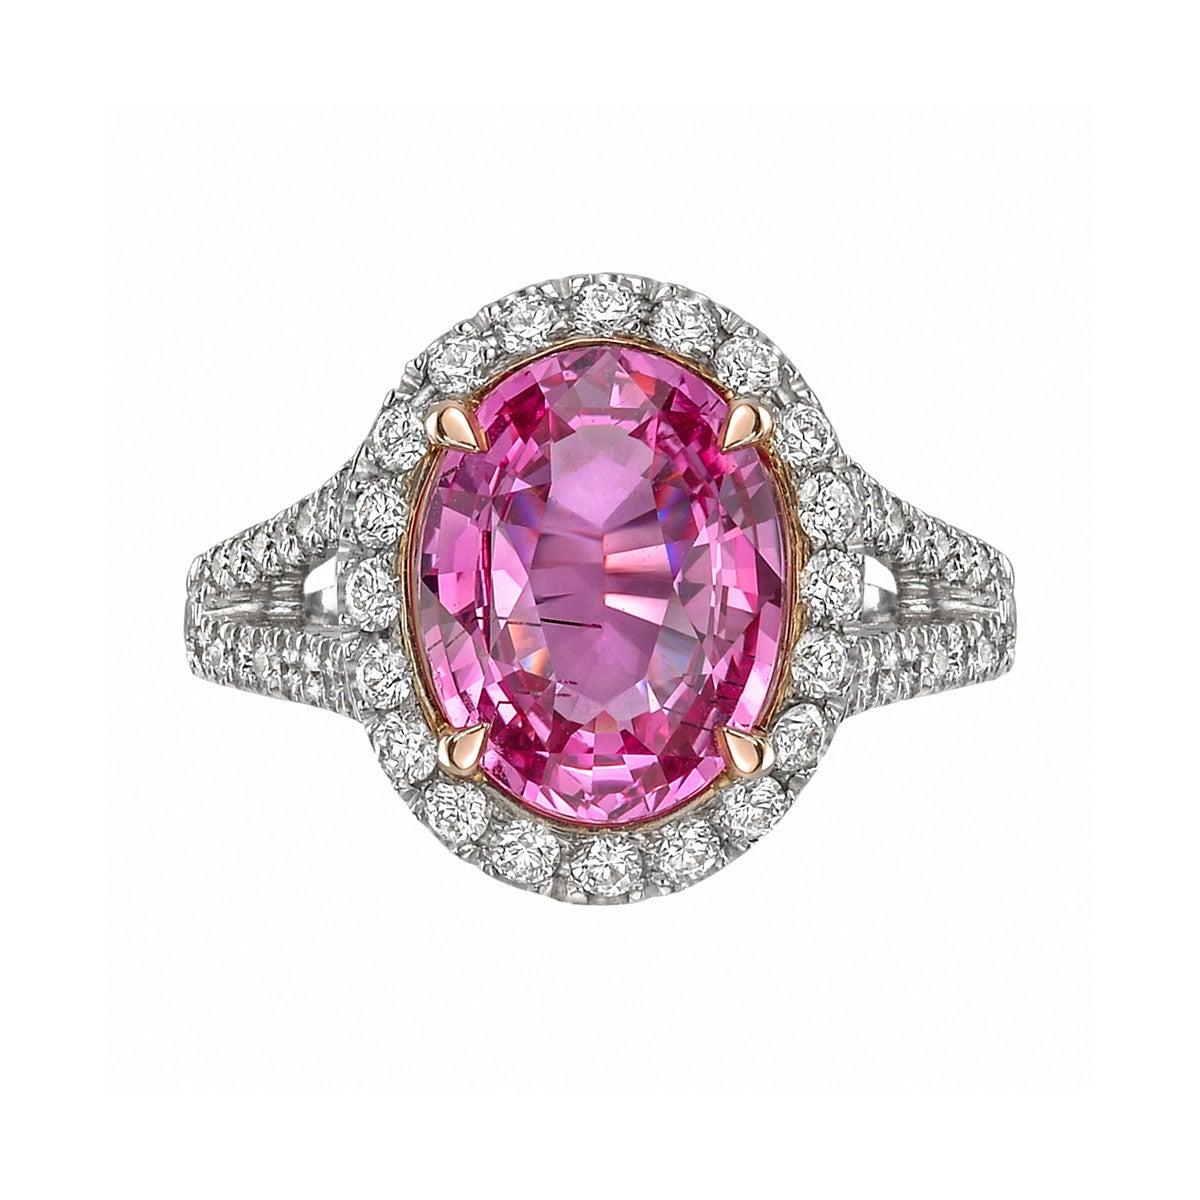 Raymond C. Yard 10.81 Carat Sapphire Diamond Ring at 1stdibs